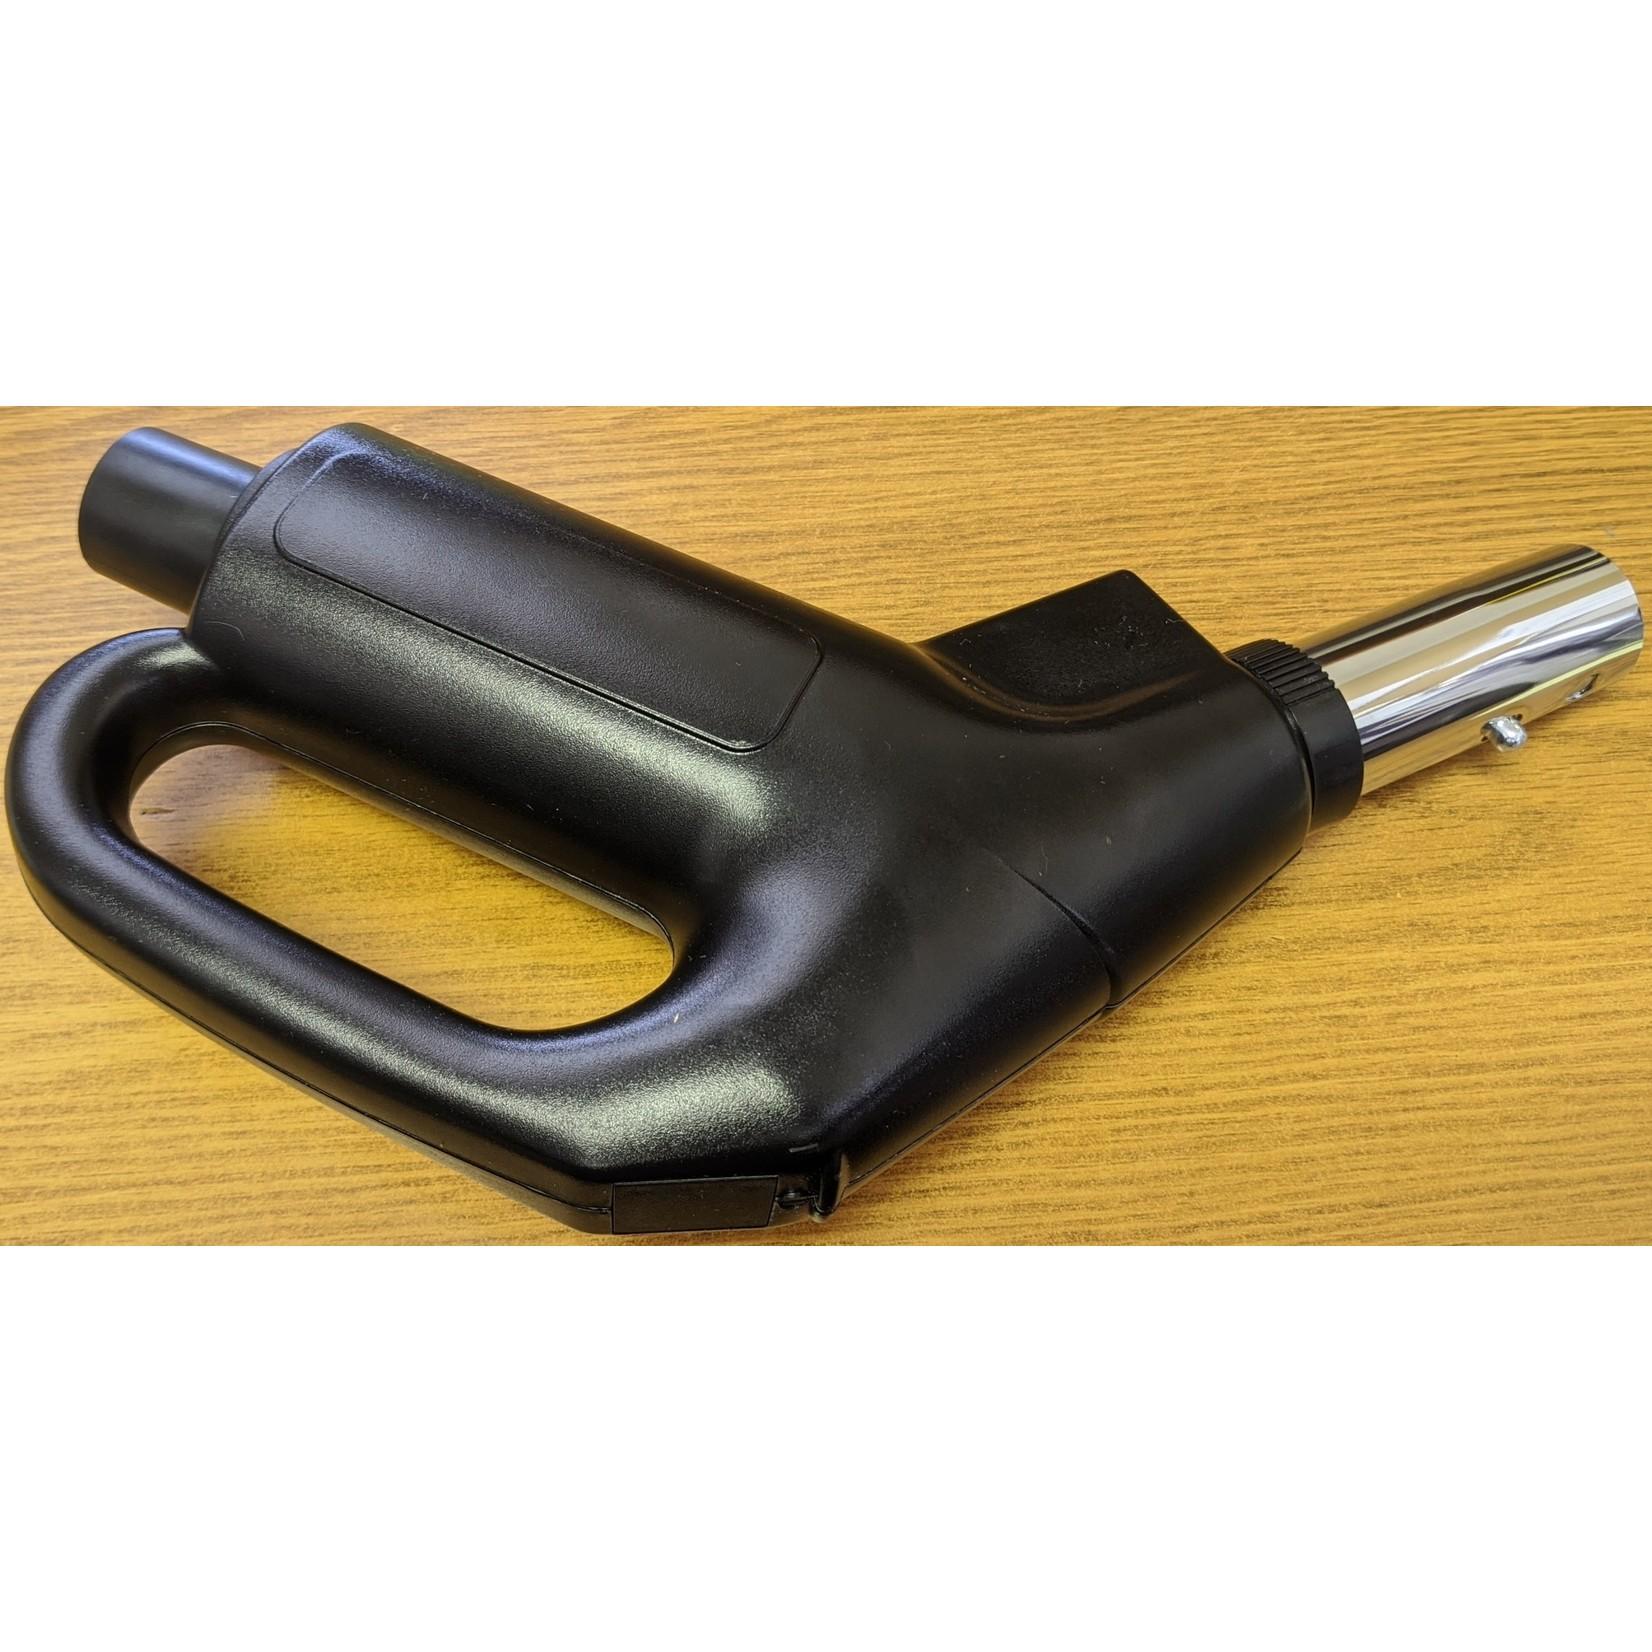 Plastiflex Copy of Hide A Hose Ready Grip Handle - Direct Connect